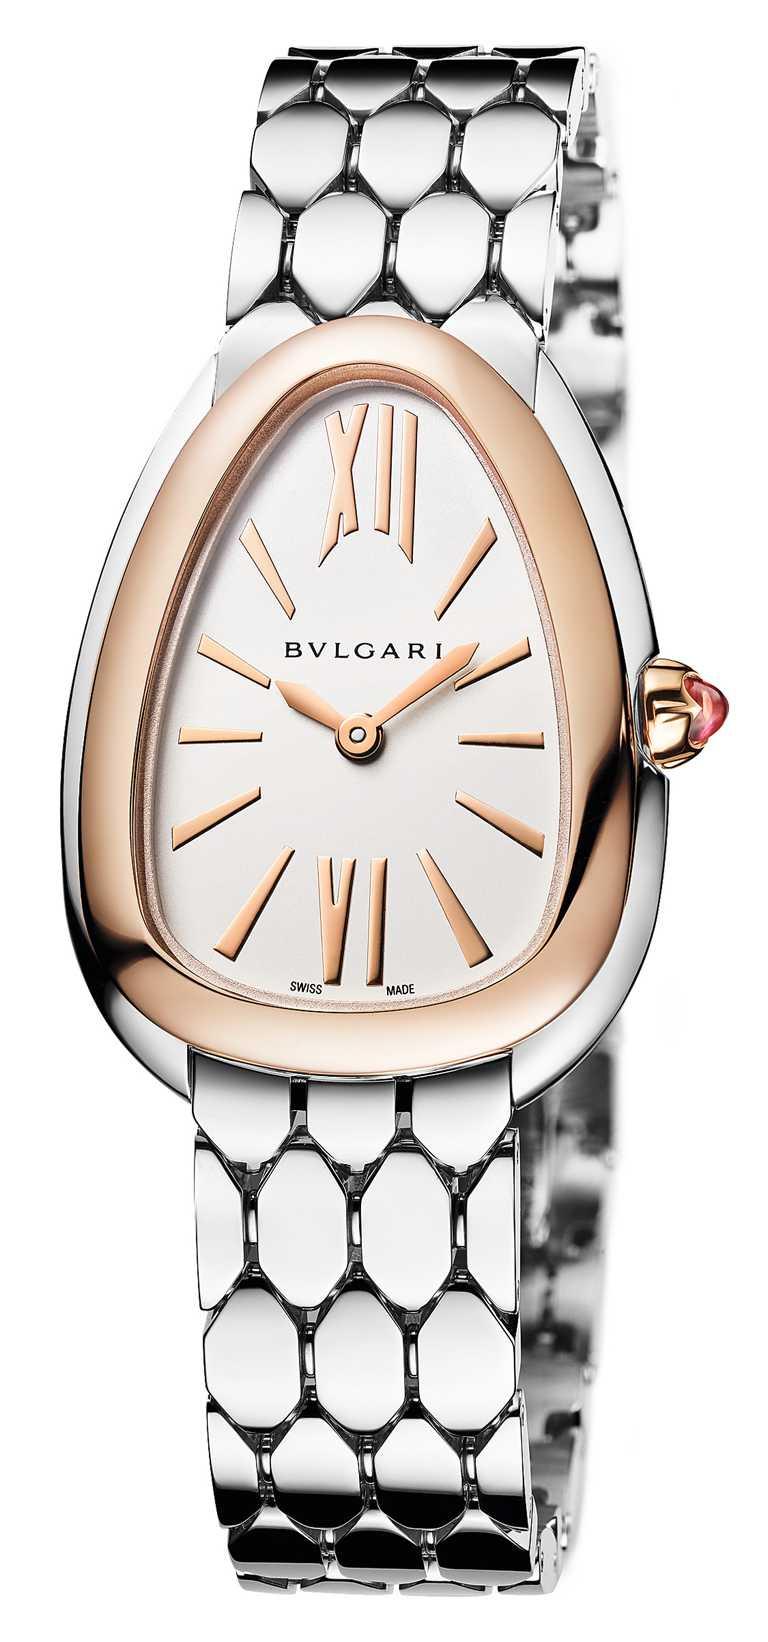 BVLGARI「Serpenti Seduttori」系列,玫瑰金與精鋼腕錶╱220,900元。(圖╱BVLGARI提供)